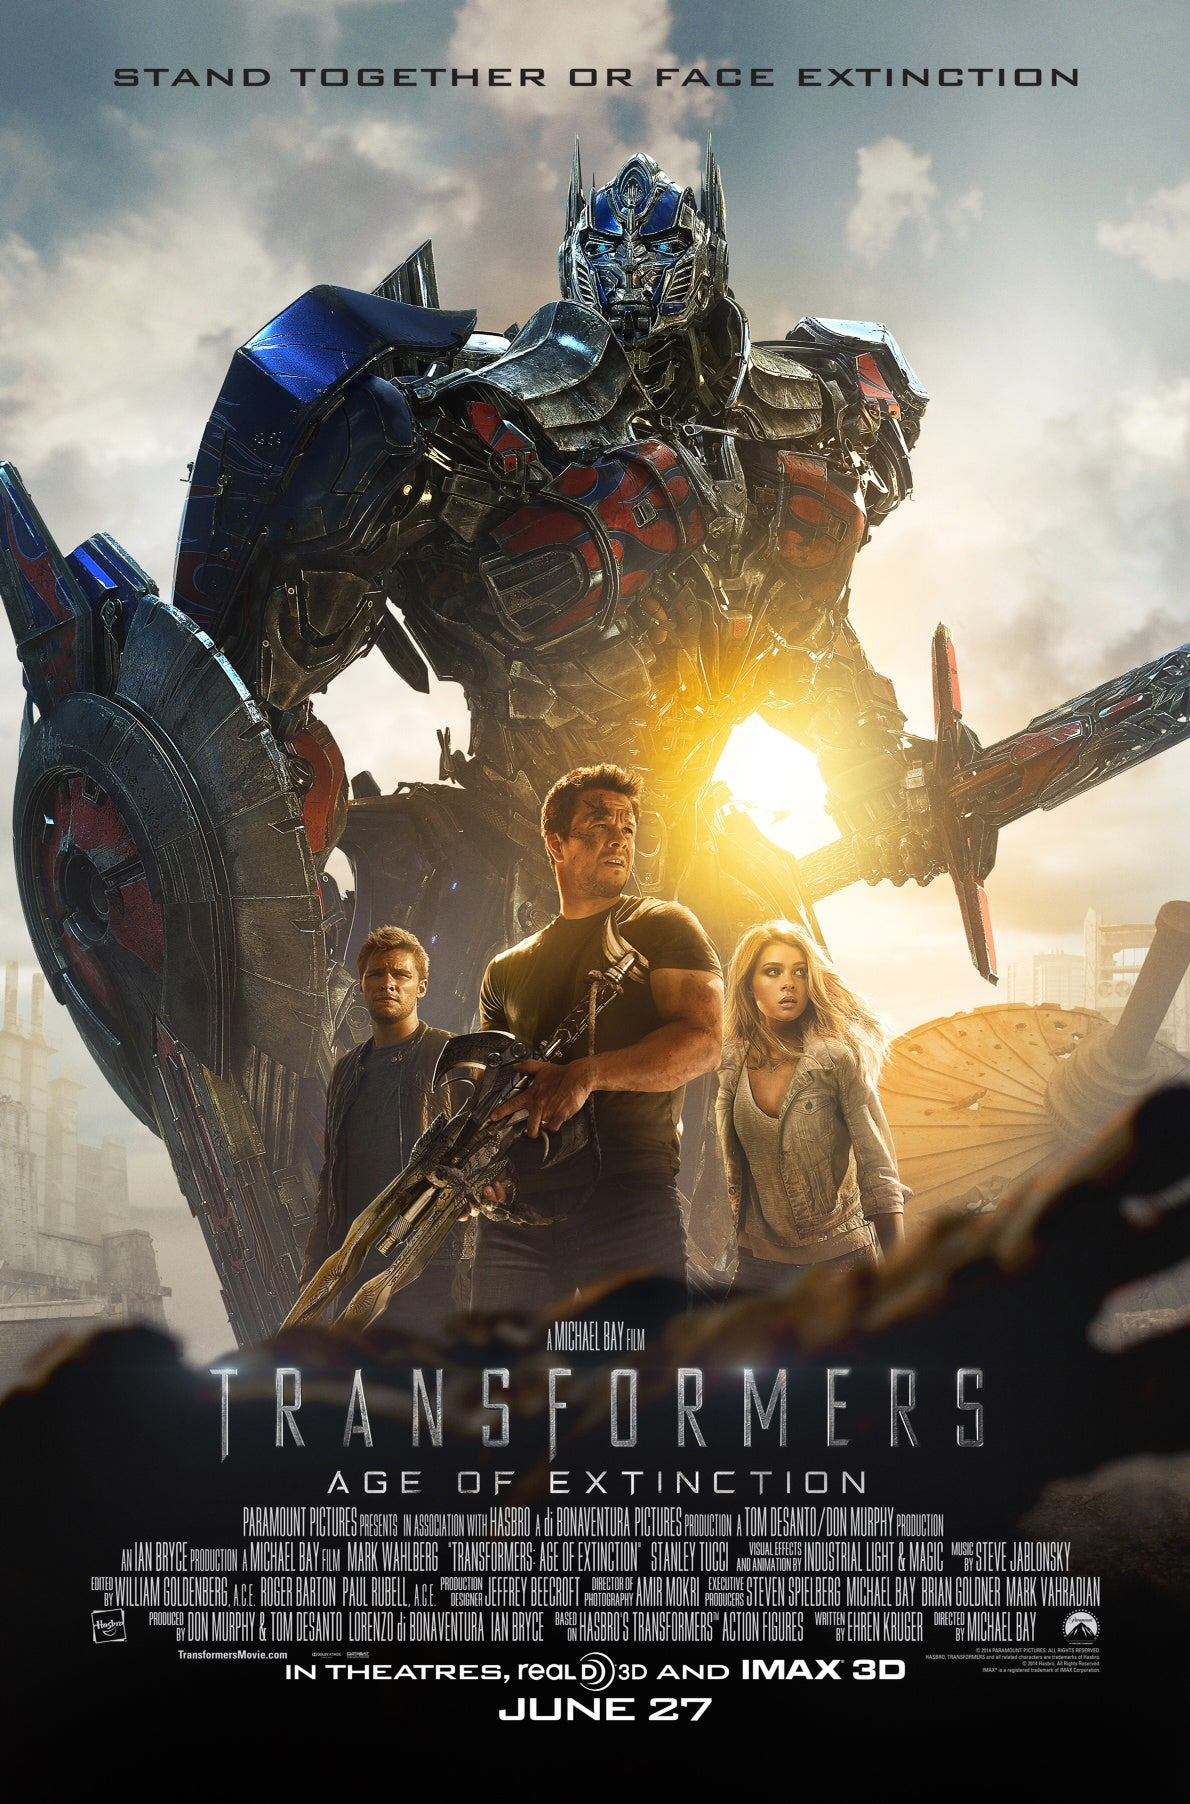 Transformers Age of Extinction – Transformers Vârsta de dispariție (2014)